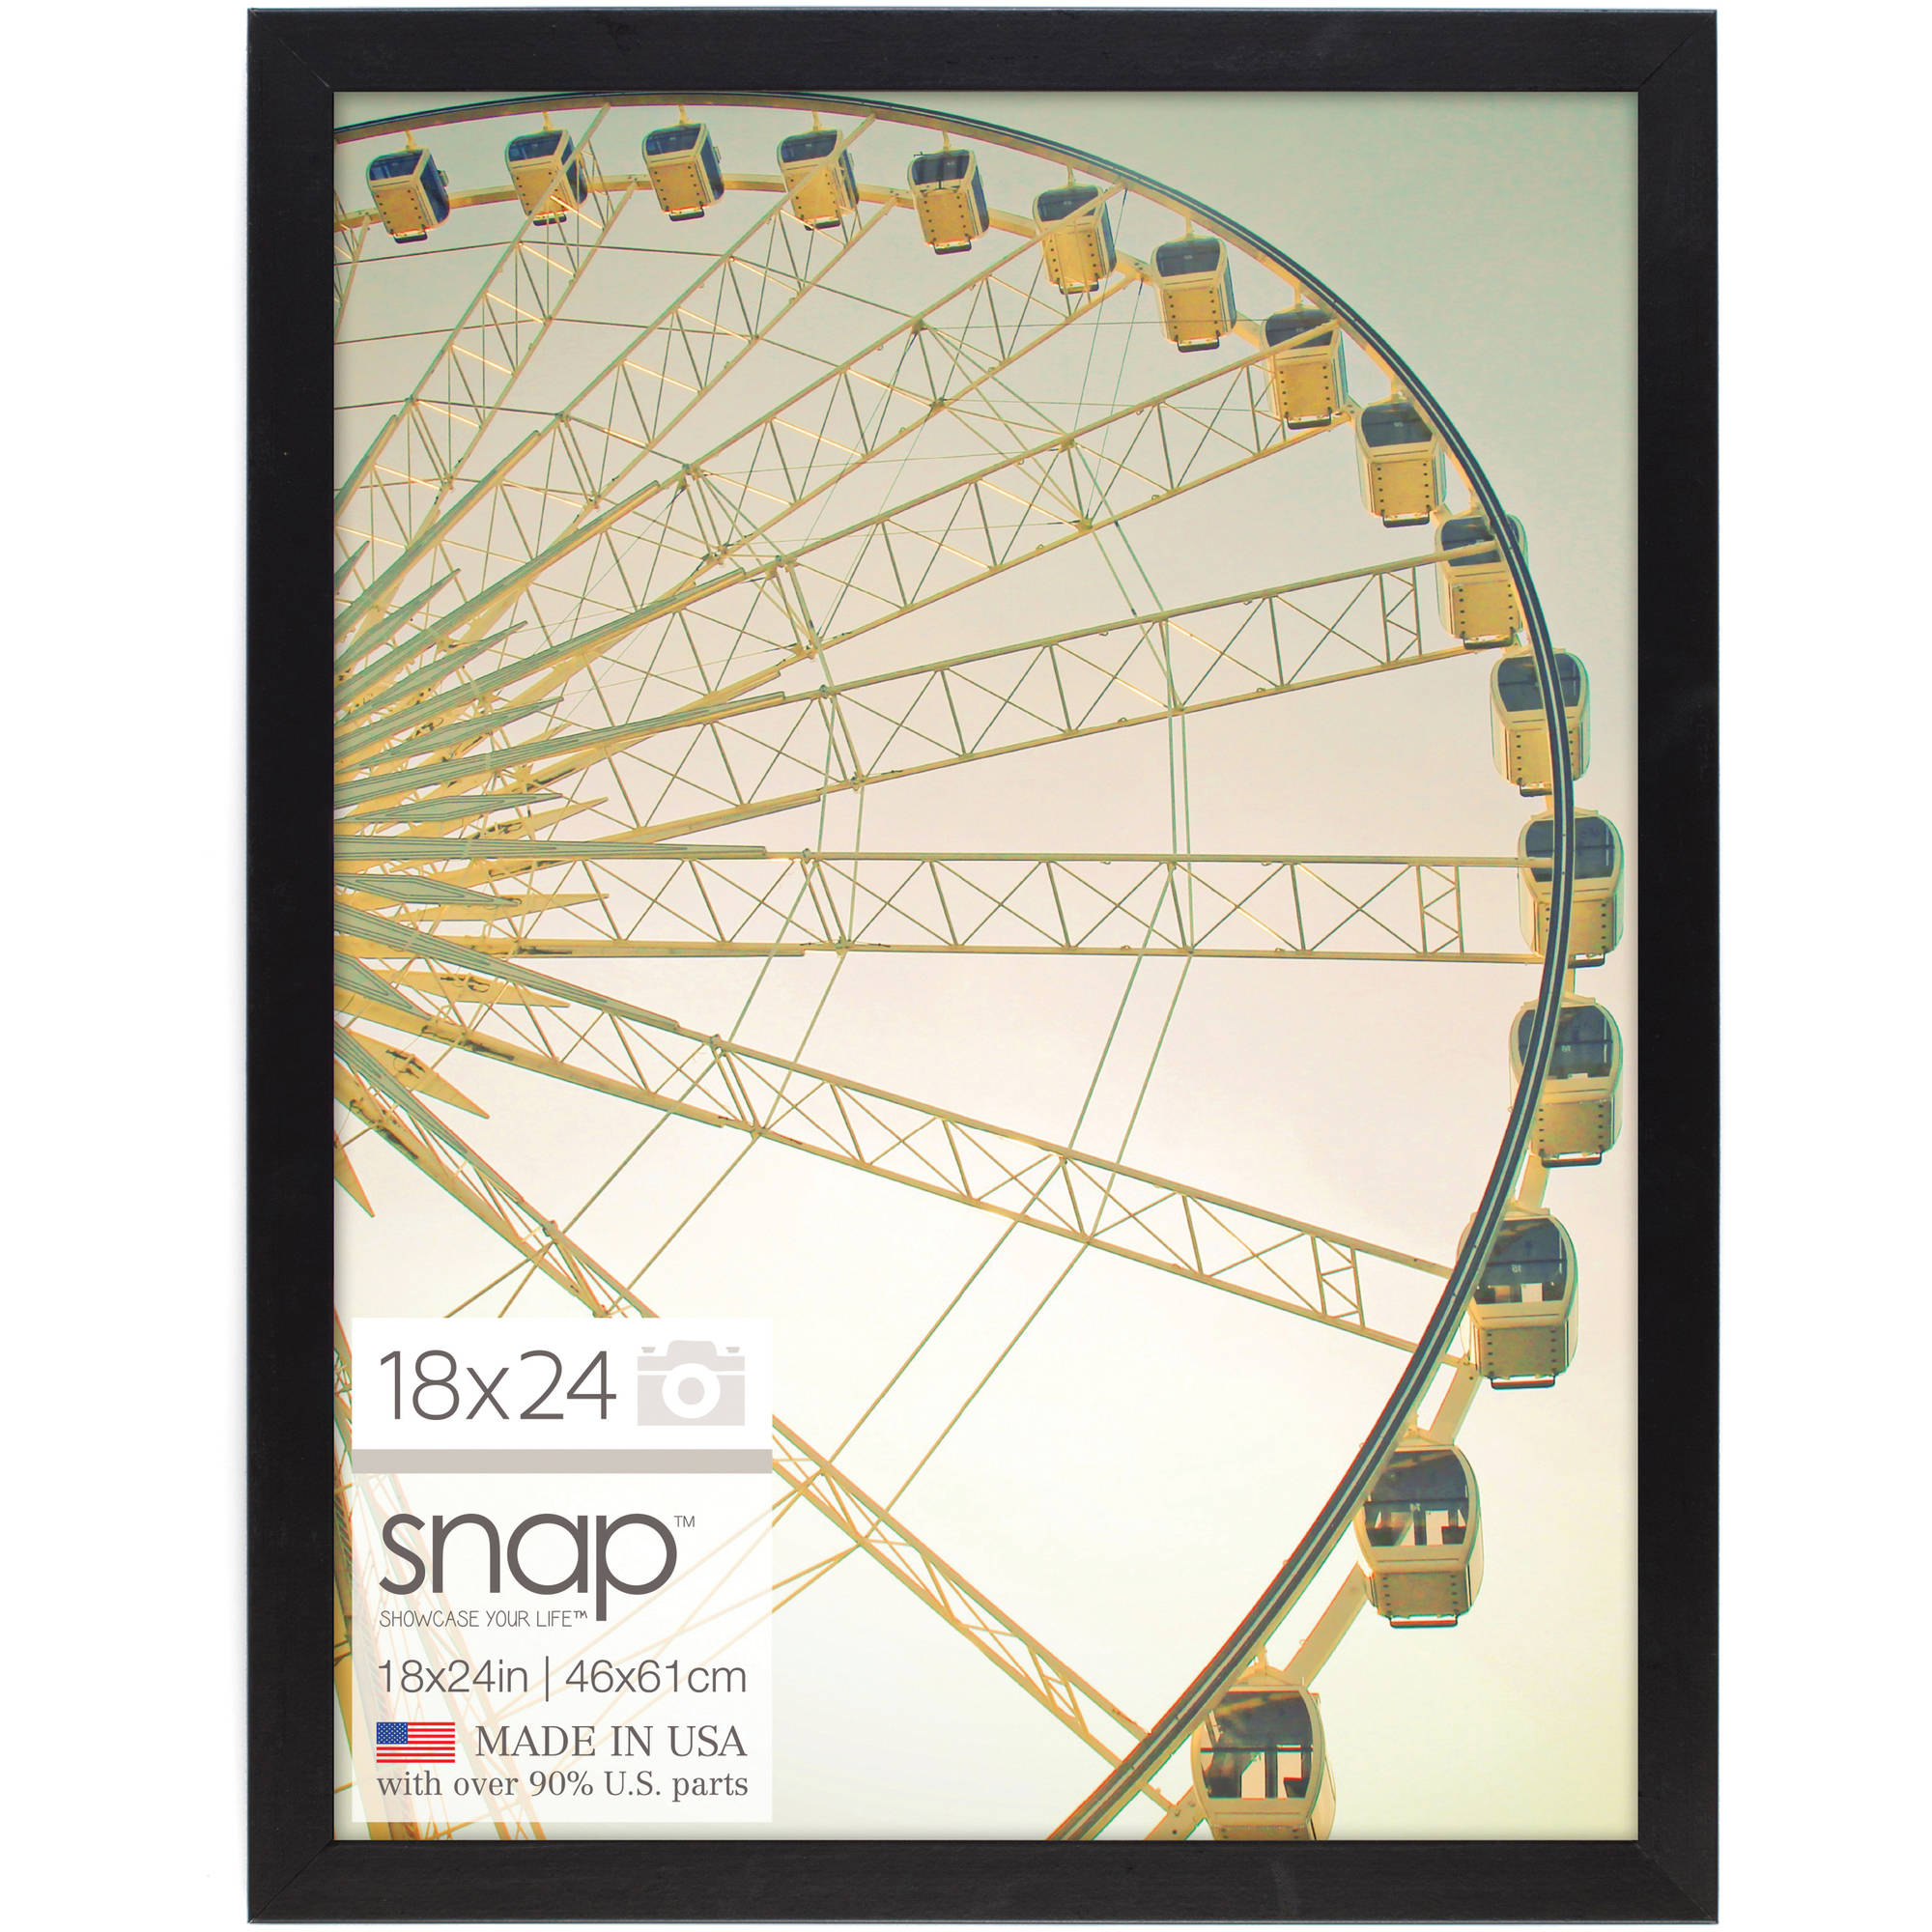 snap black square poster frame 18 x24 walmart com